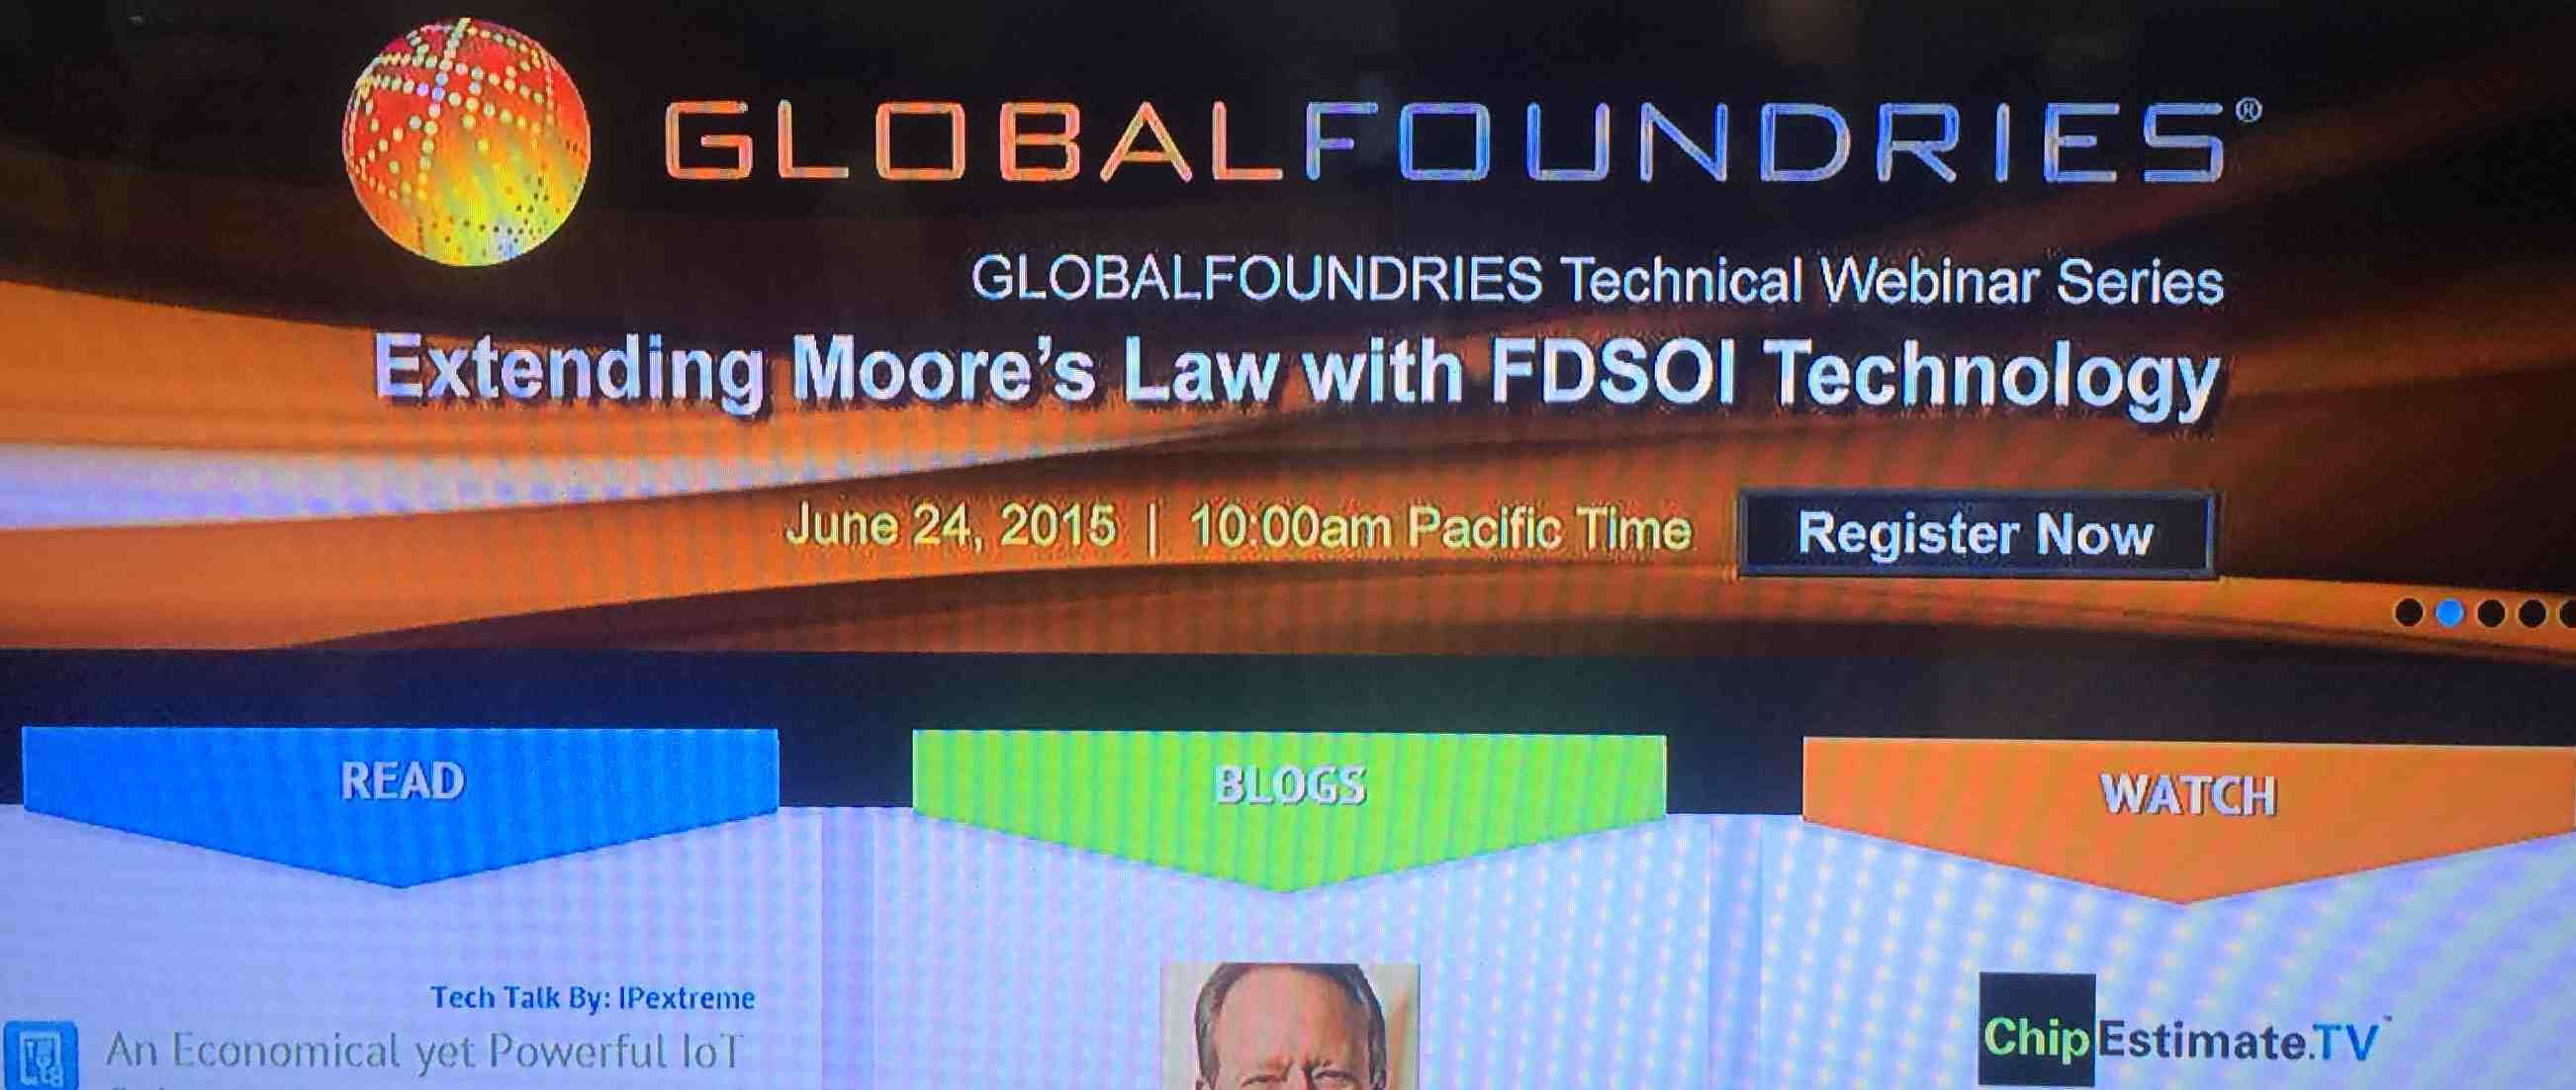 GlobalFoundries FD-SOI Webinar 24 June 2015, 10am PST: Be